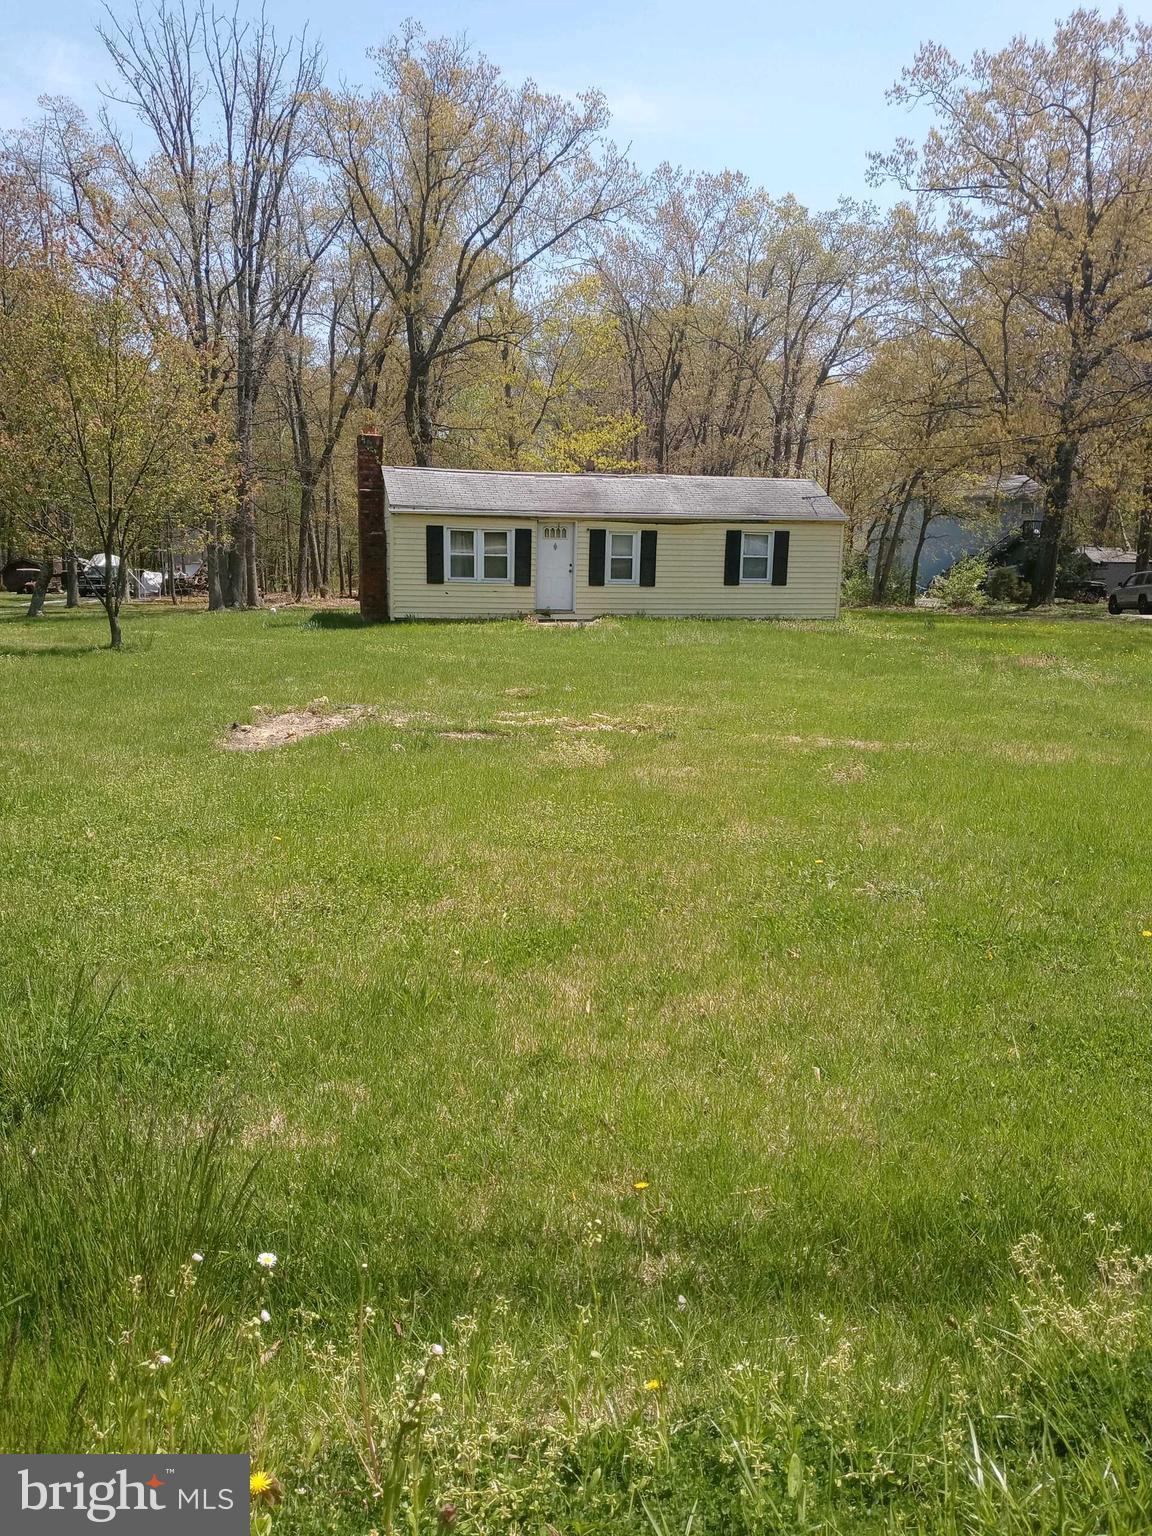 253 SEVERN ROAD, MILLERSVILLE, Maryland 21108, 2 Bedrooms Bedrooms, ,1 BathroomBathrooms,Single Family,For Sale,253 SEVERN ROAD,MDAA466610